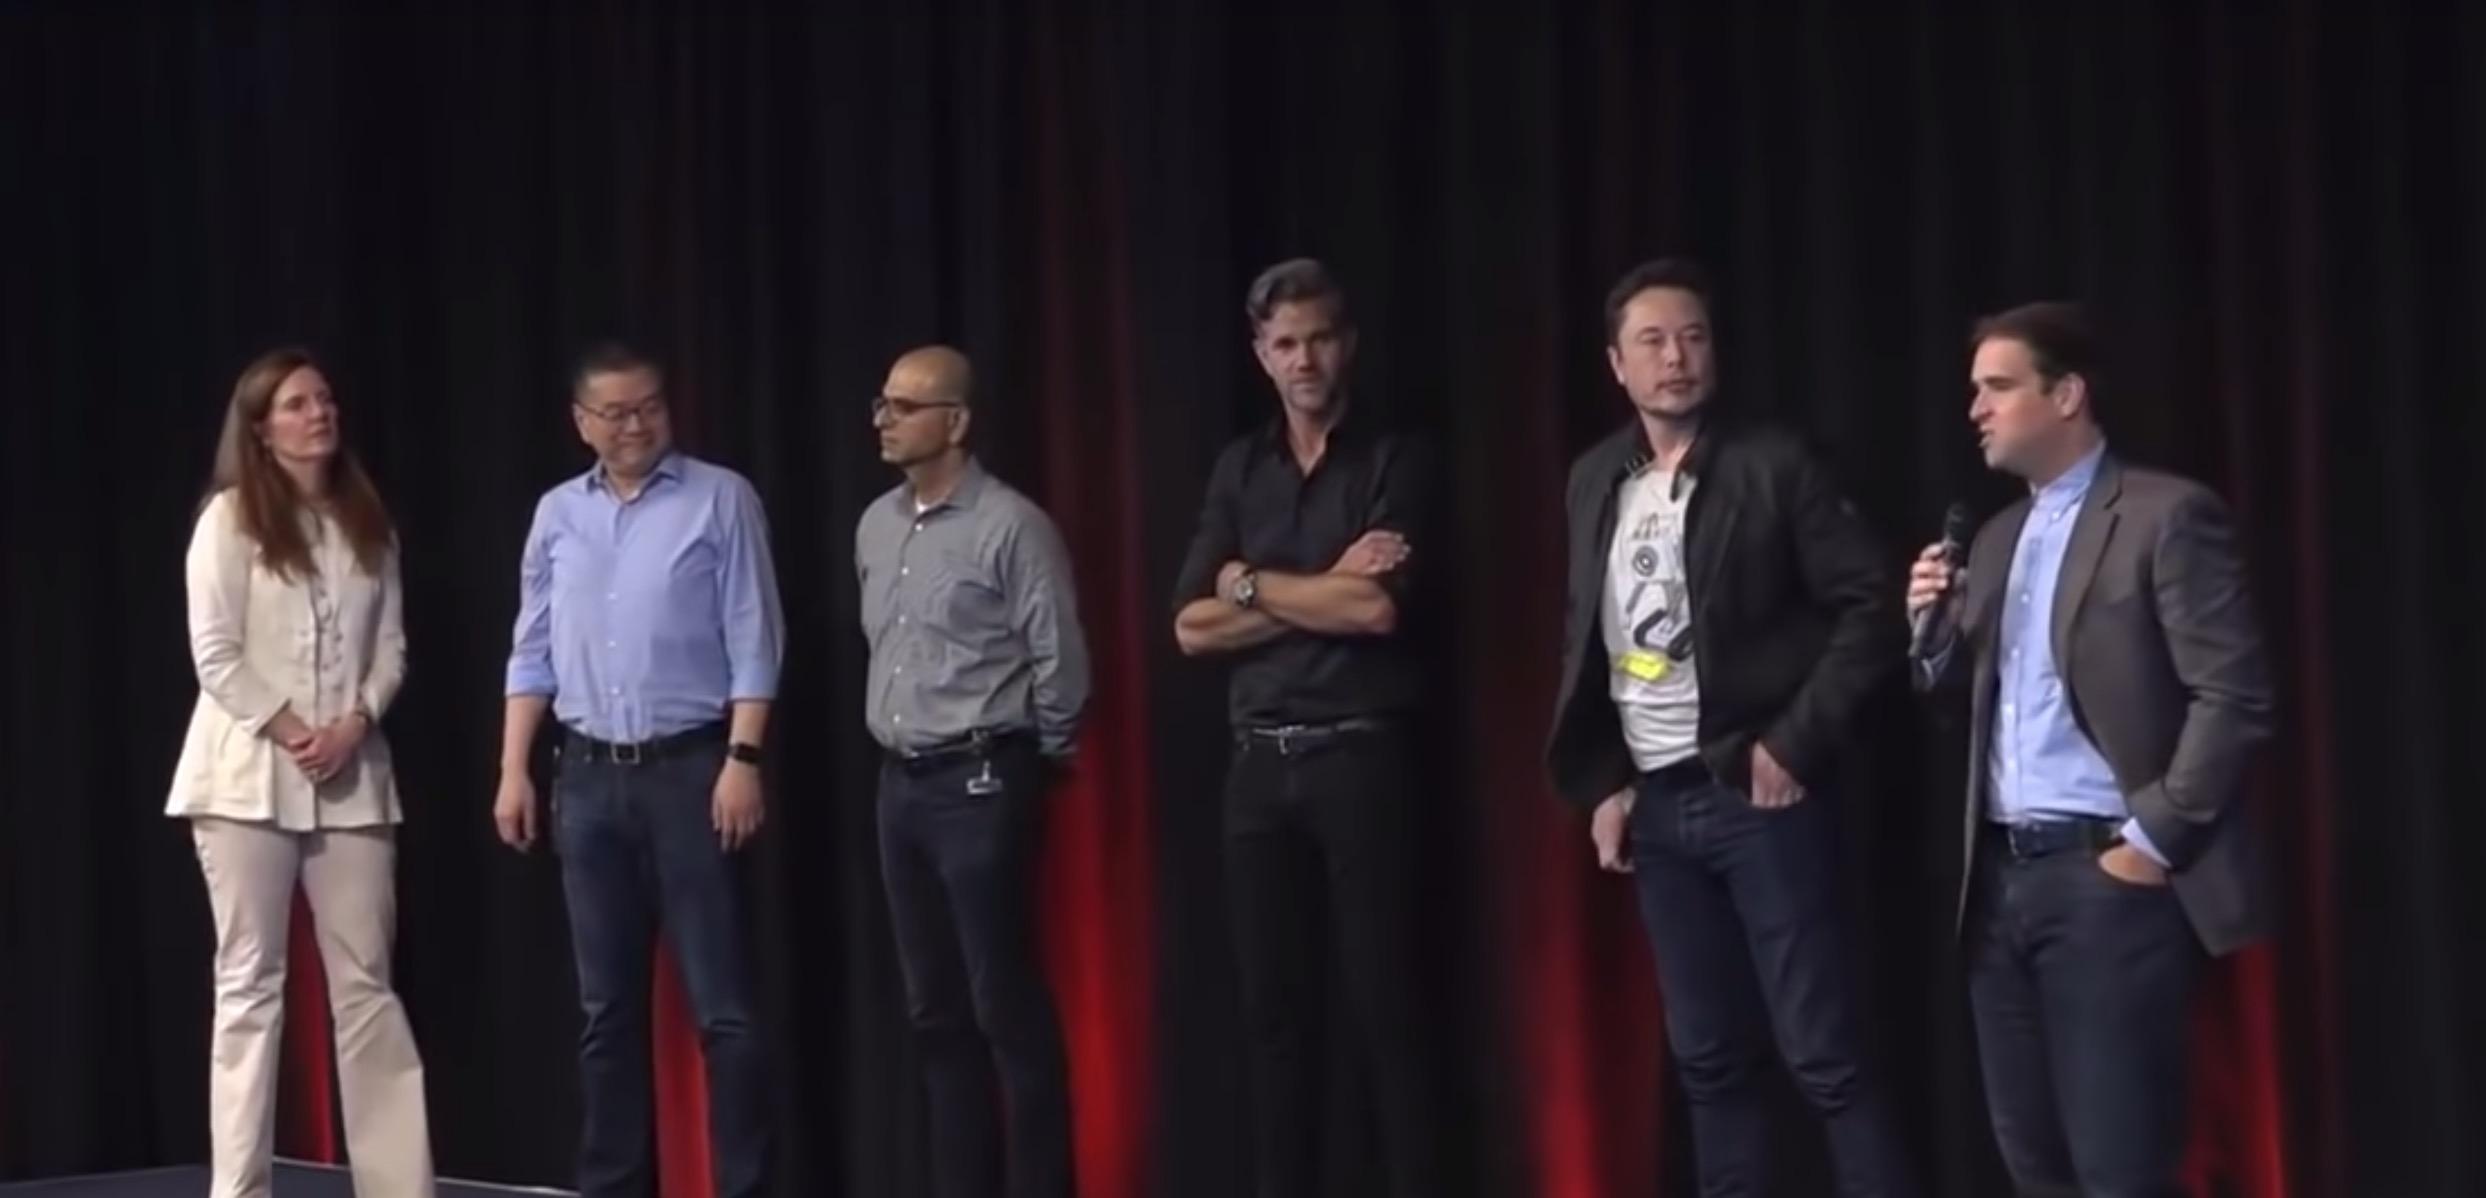 Tesla Shareholder's Meeting News Hub - Electrek